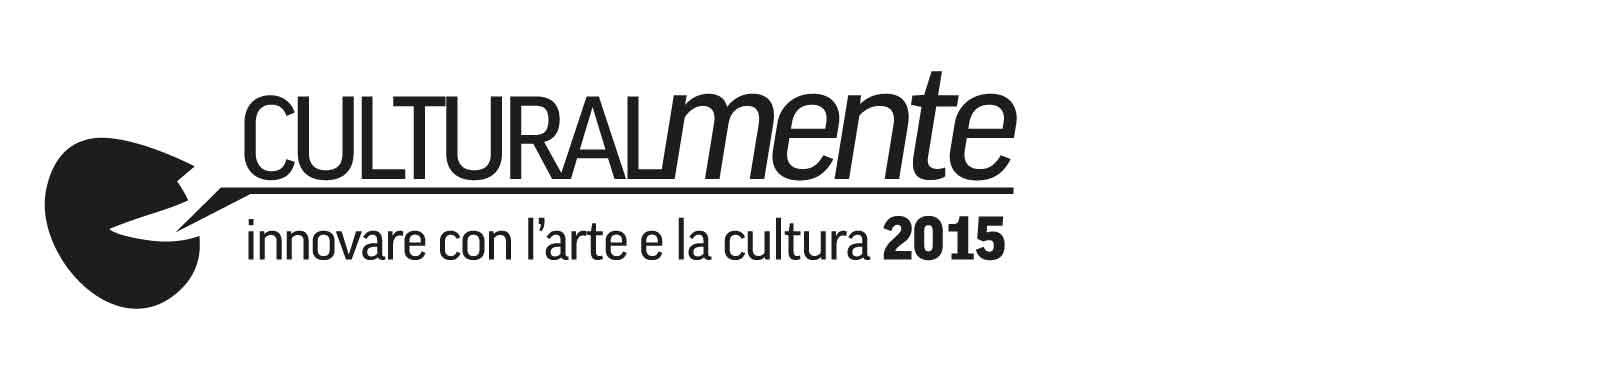 http://www.tumbo.it/ara/wp-content/uploads/2015/12/culturalmente-h.jpg